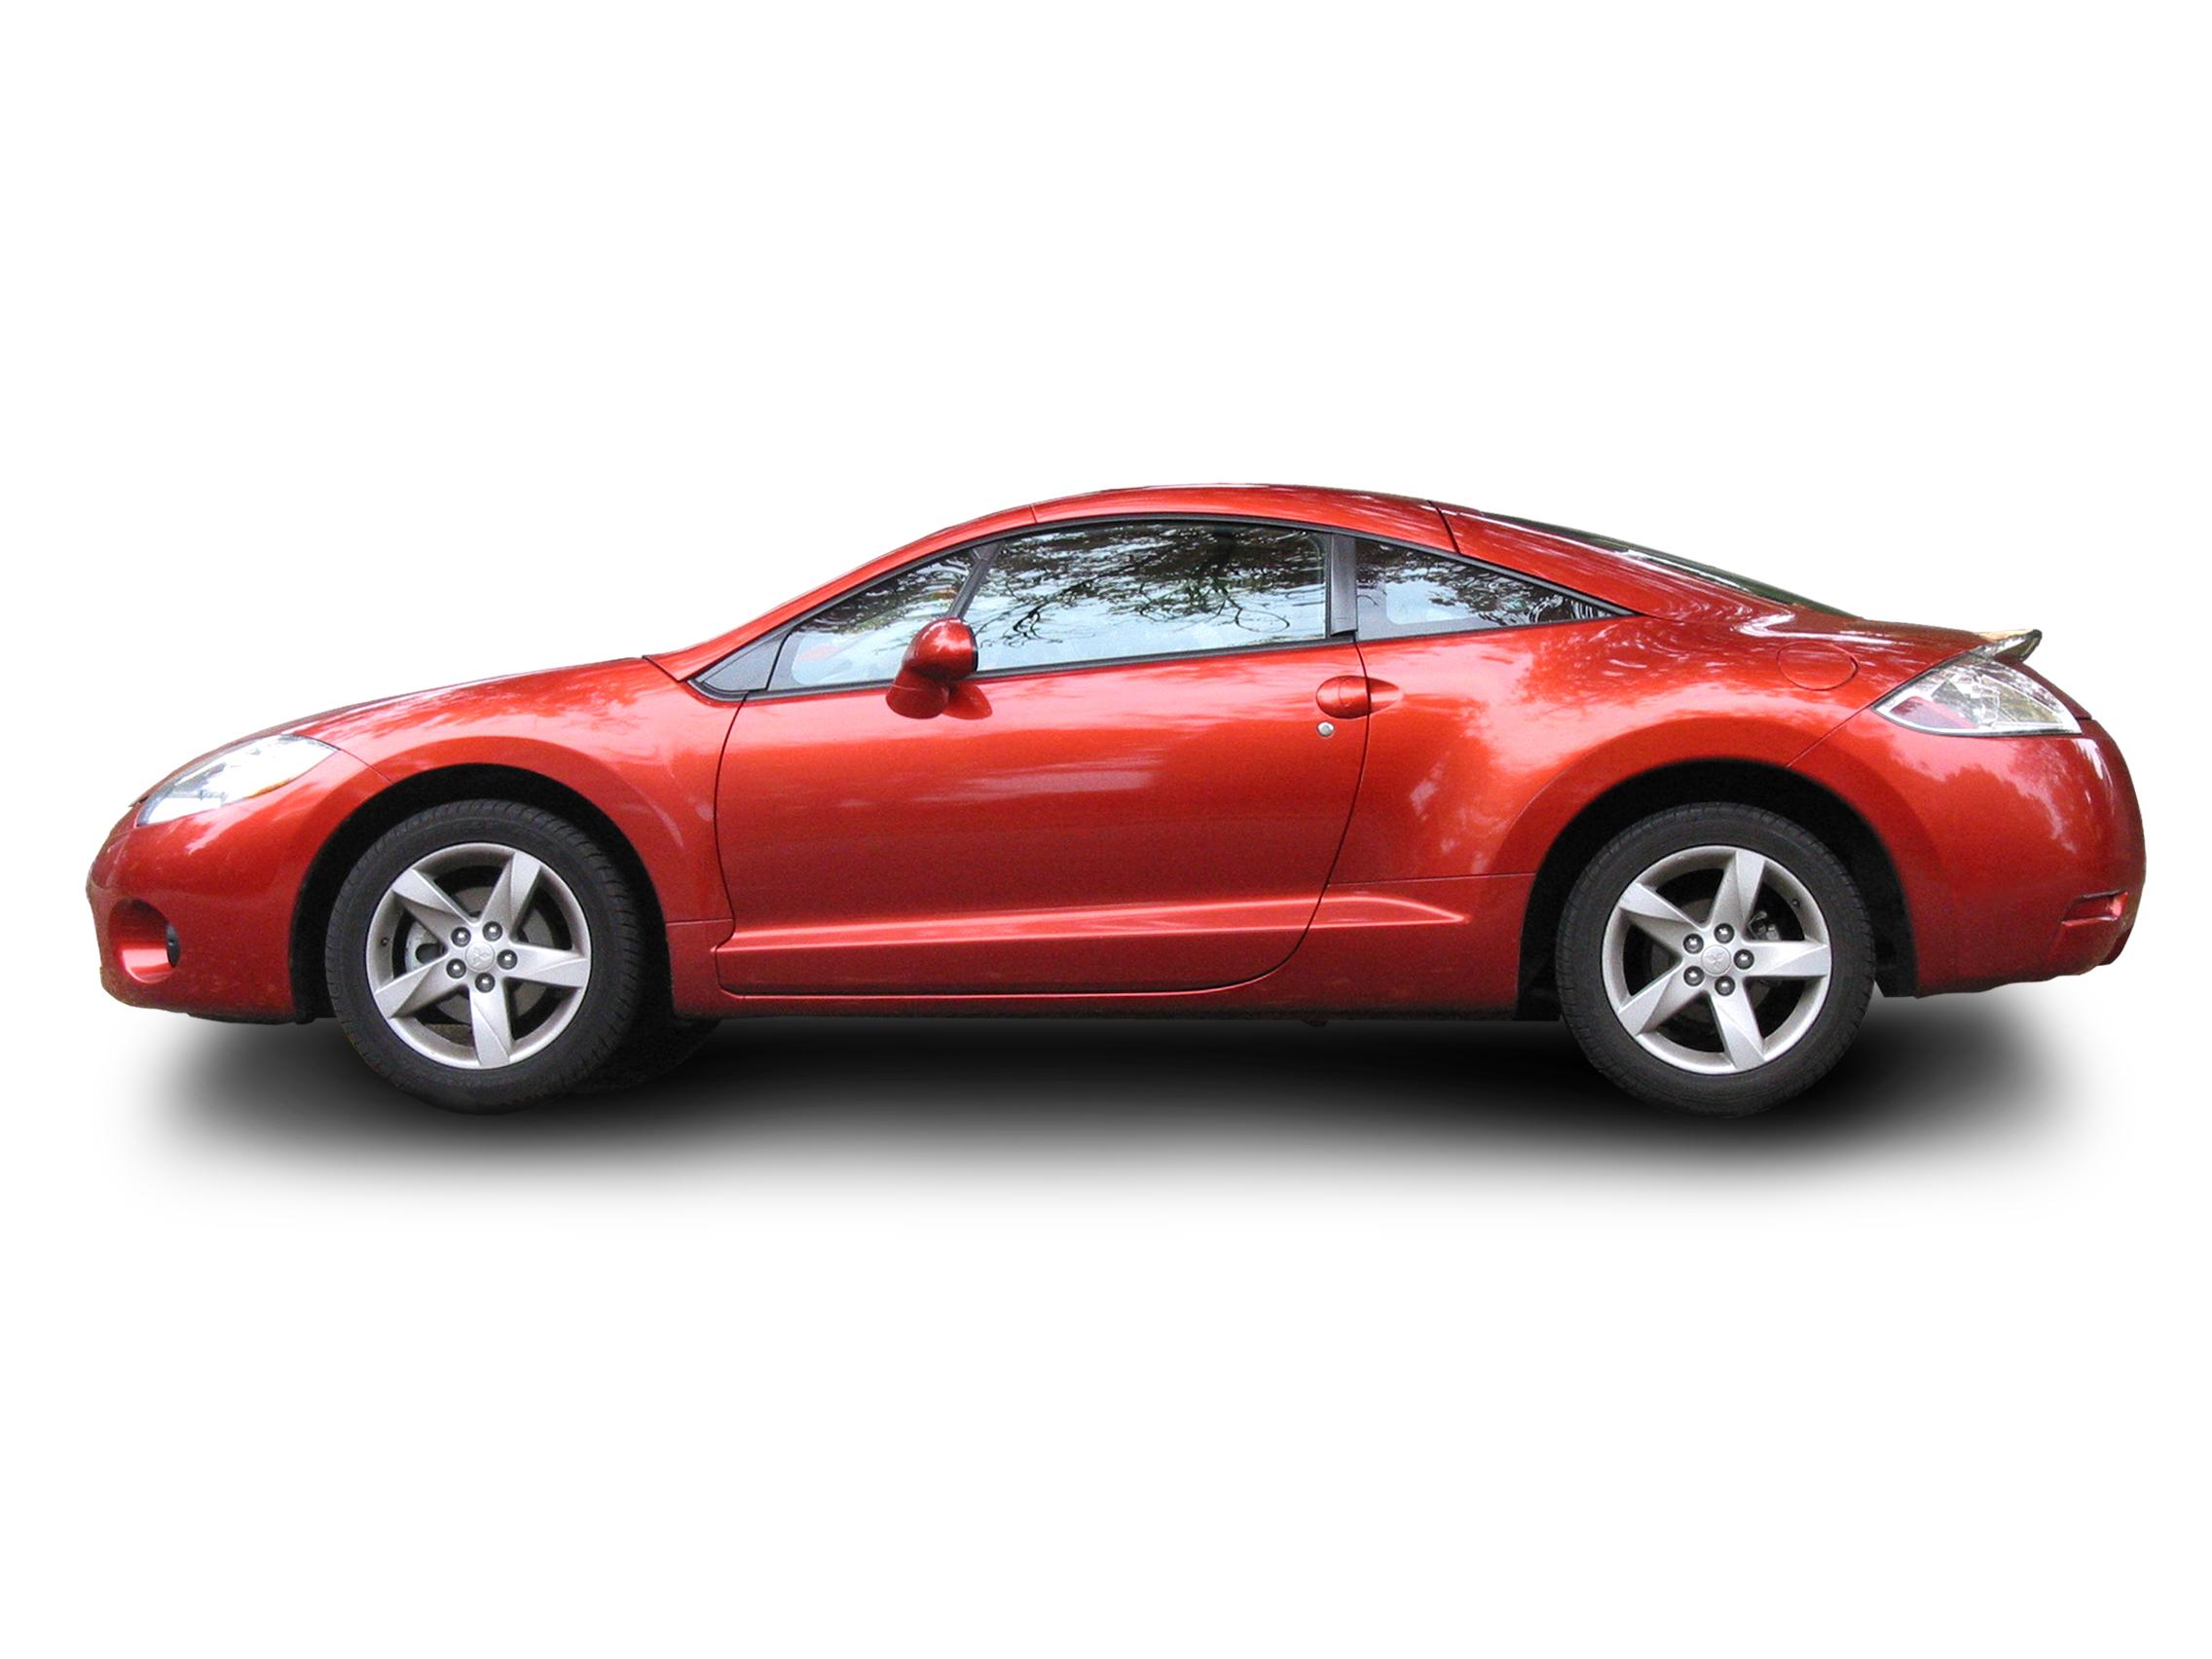 sedan car, sport car, sedan photo, car, auto, automobile